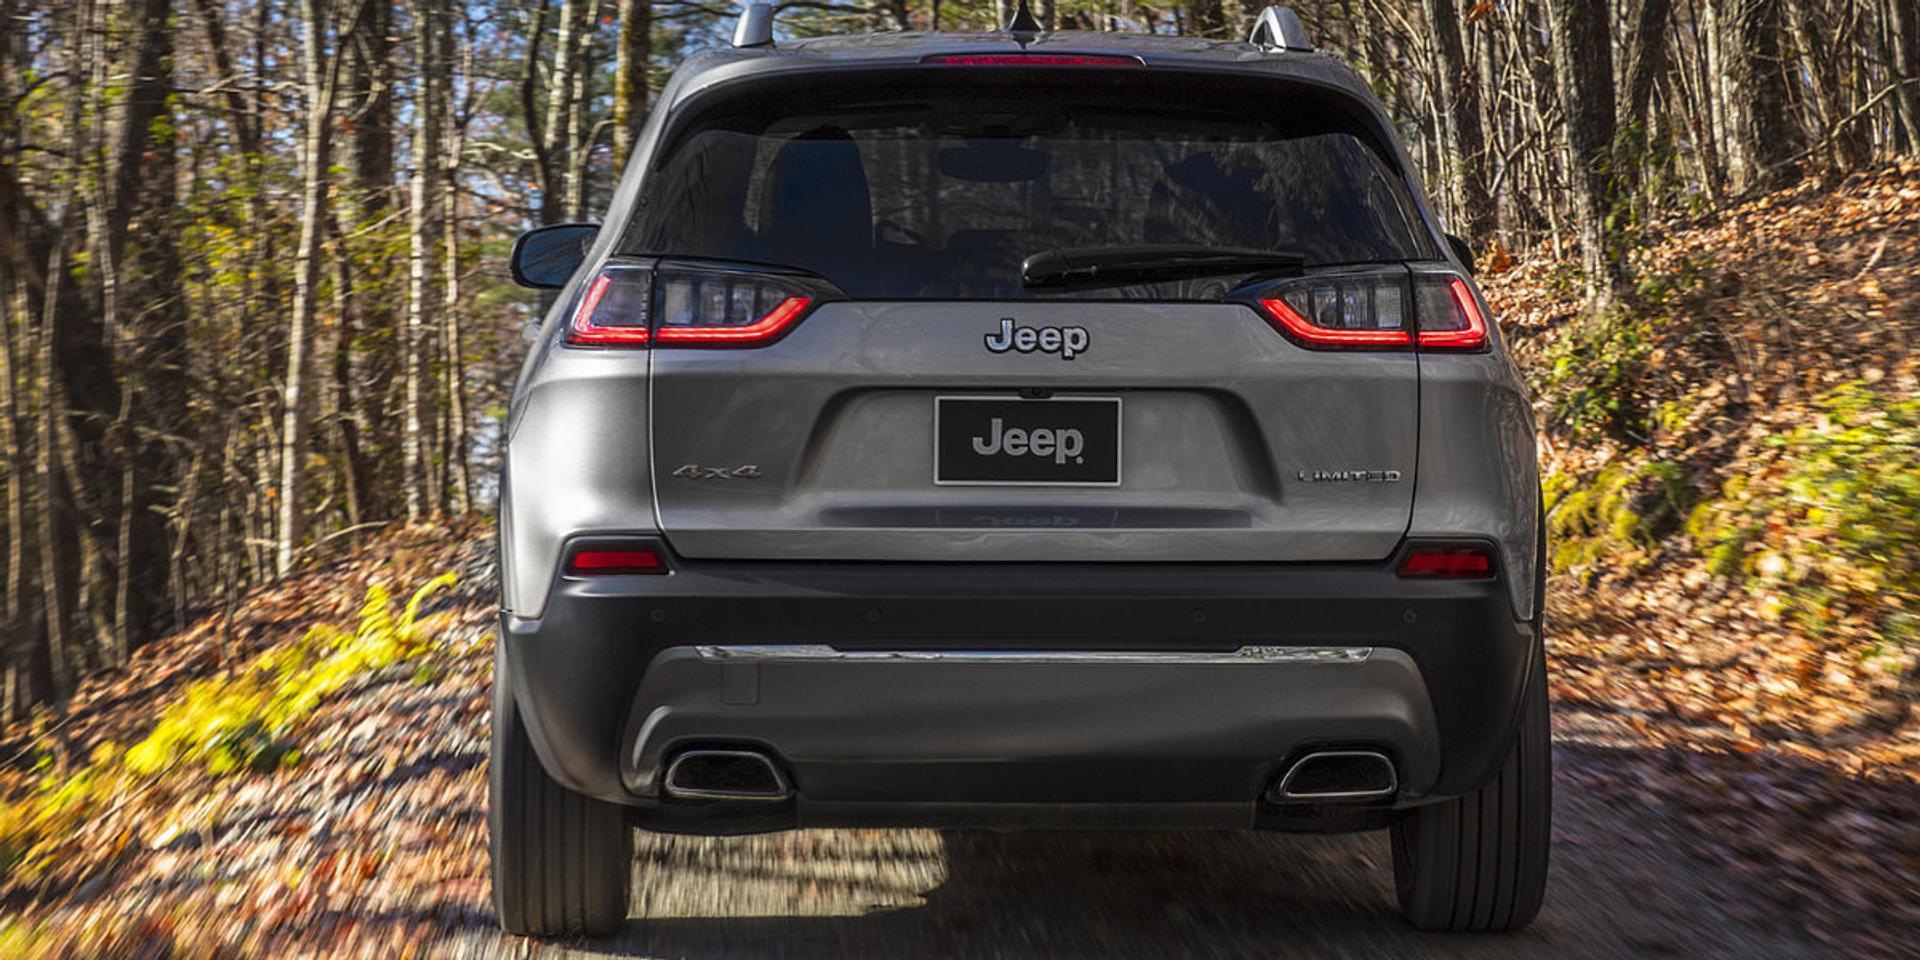 Jeep Cherokee rear view